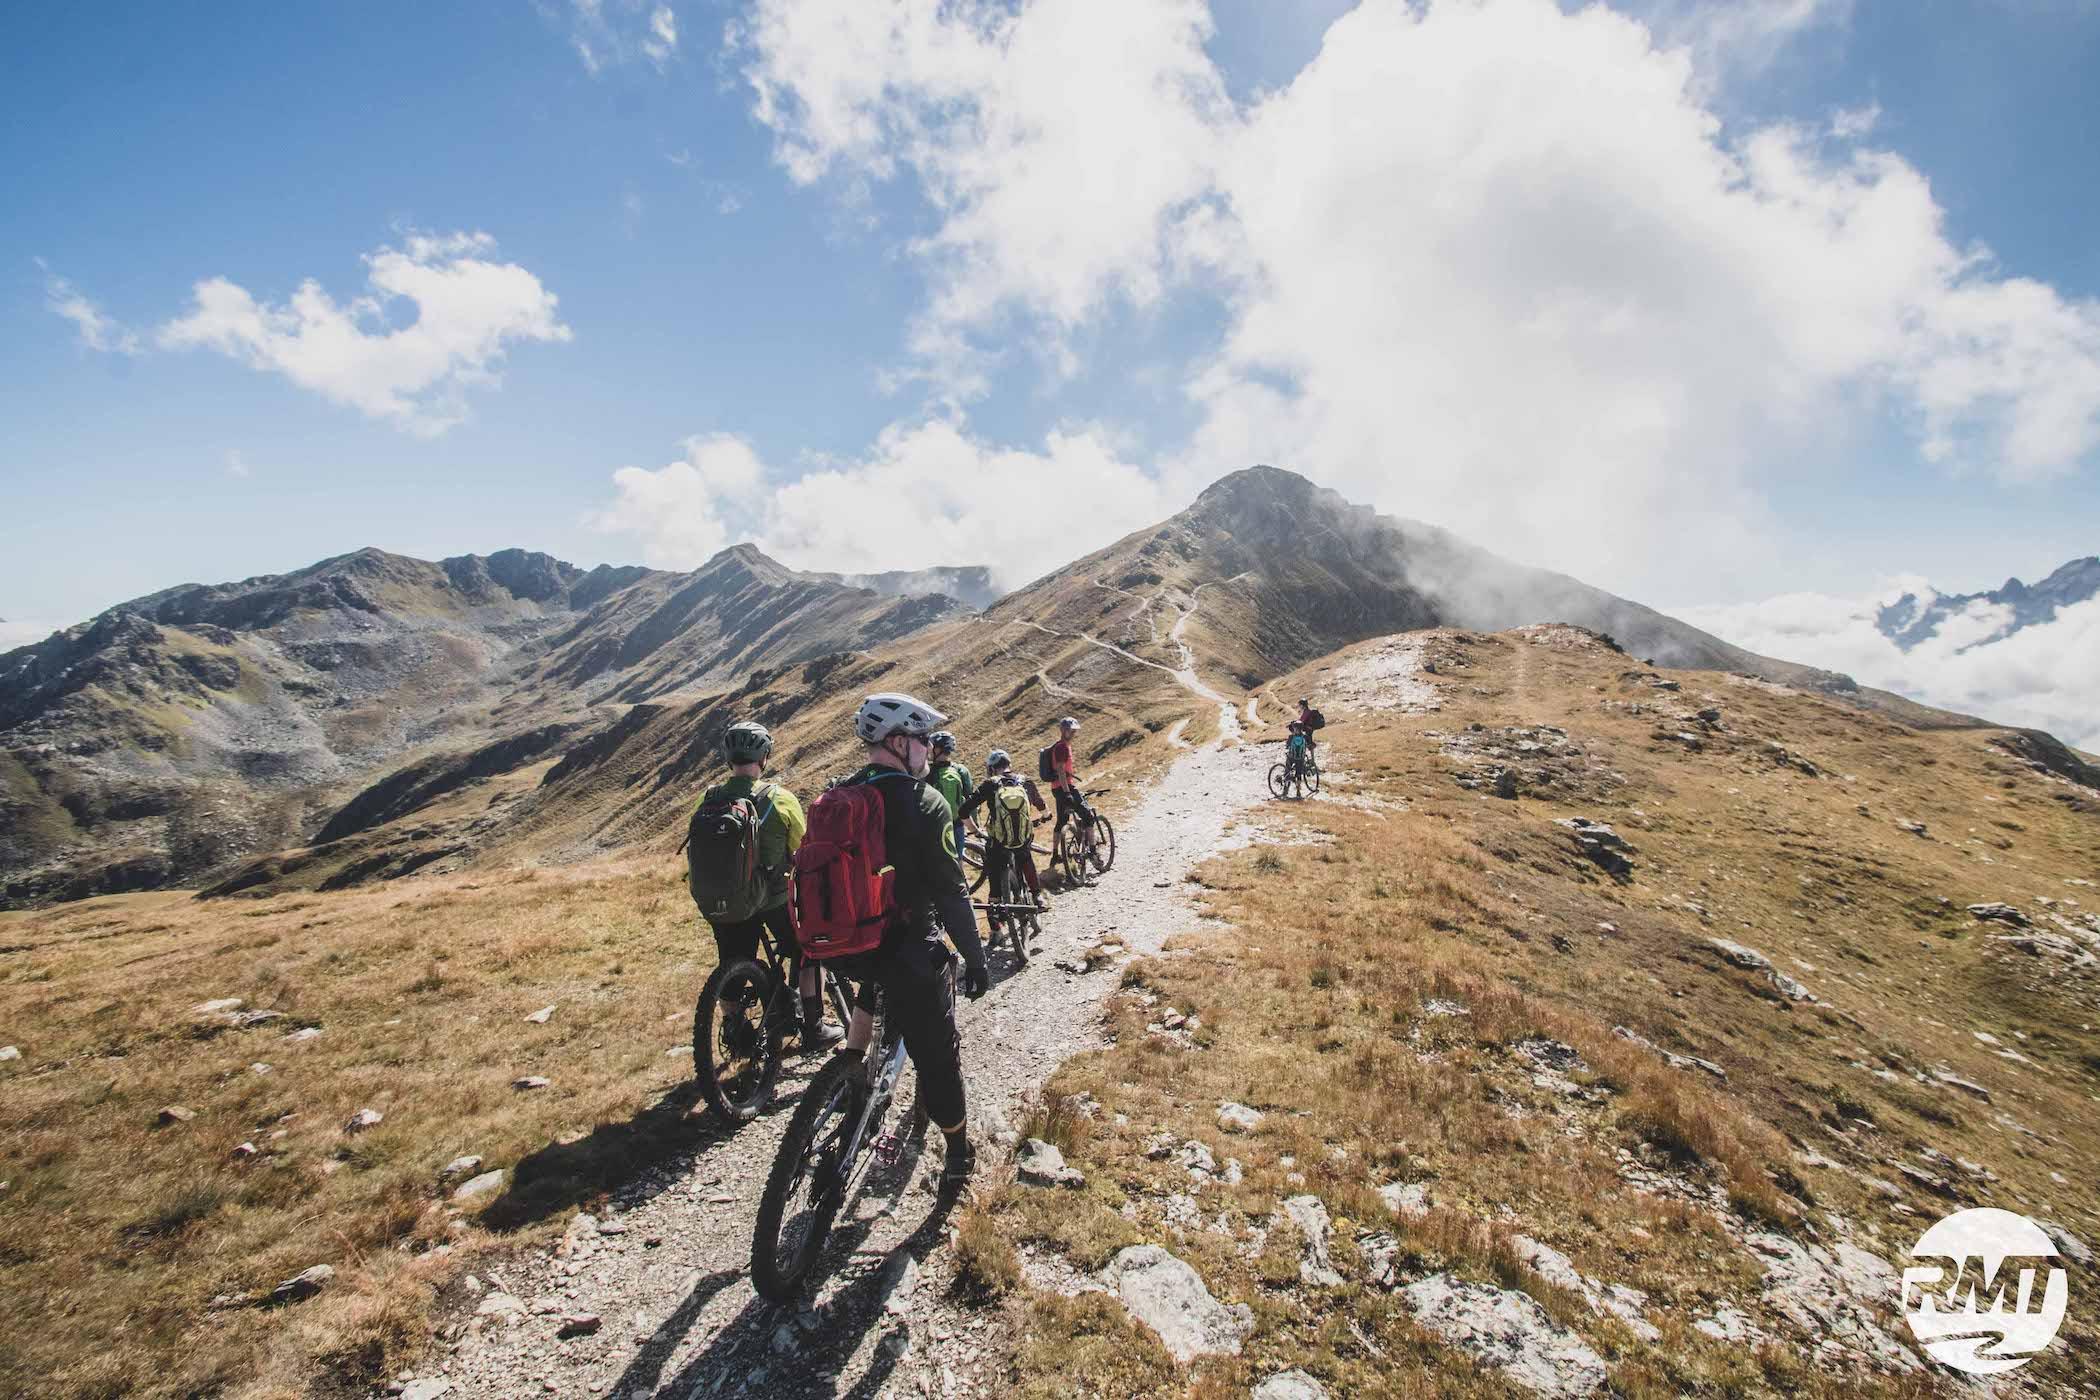 DolomitenCross auf Trails Dolomiten Runde Tour MTB TransAlp Rock my Trail Bikeschule -40